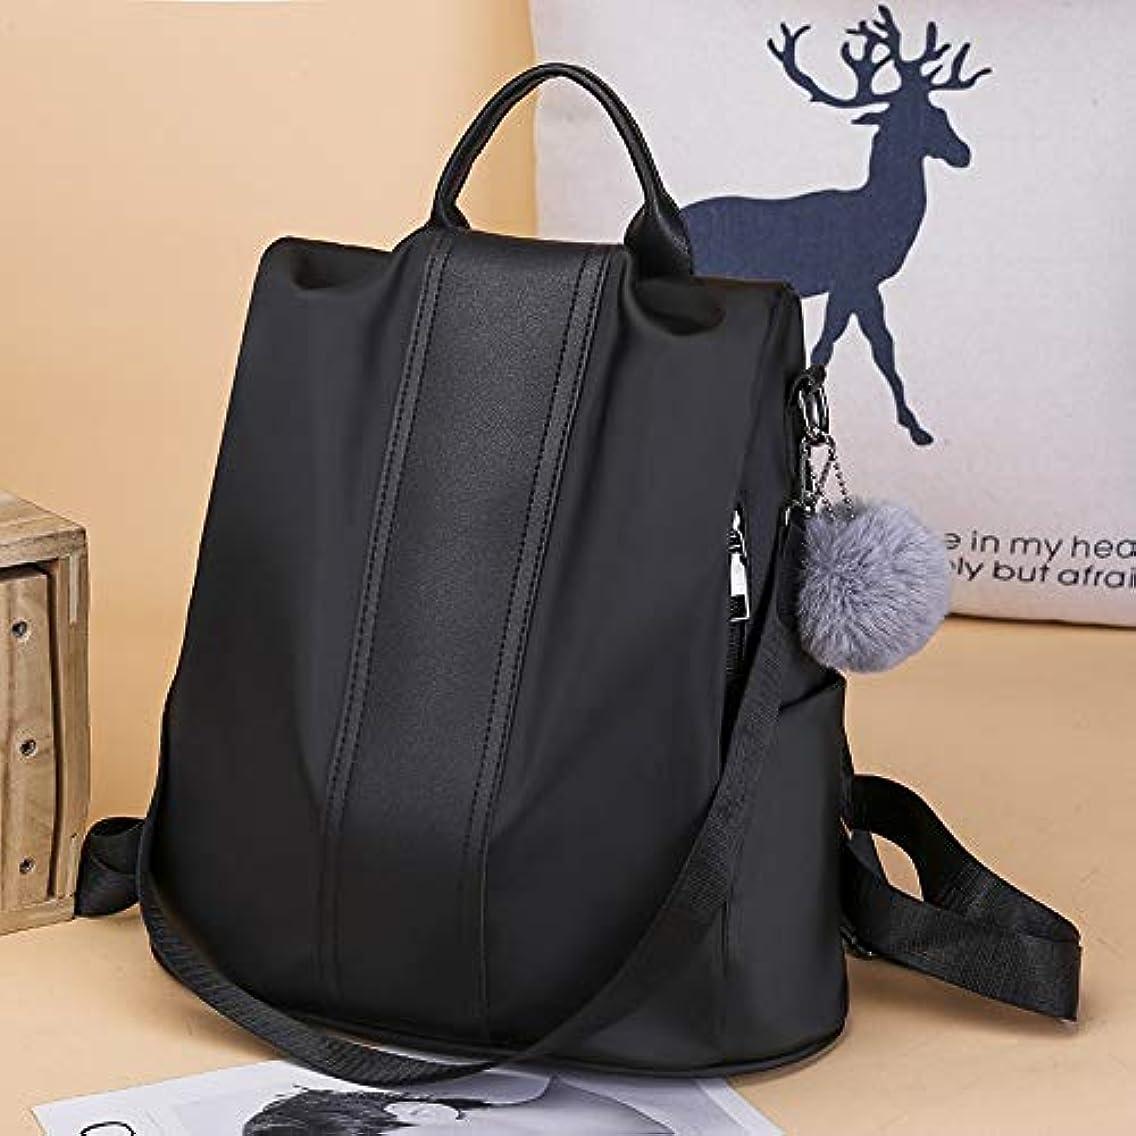 RLJJCS Oxford Cloth Shoulder Bag Female 2018 New Anti-Theft Korean Version of The Bag Wild Fashion Nylon Travel Small Backpack Handbags Backpack (Color : Black)